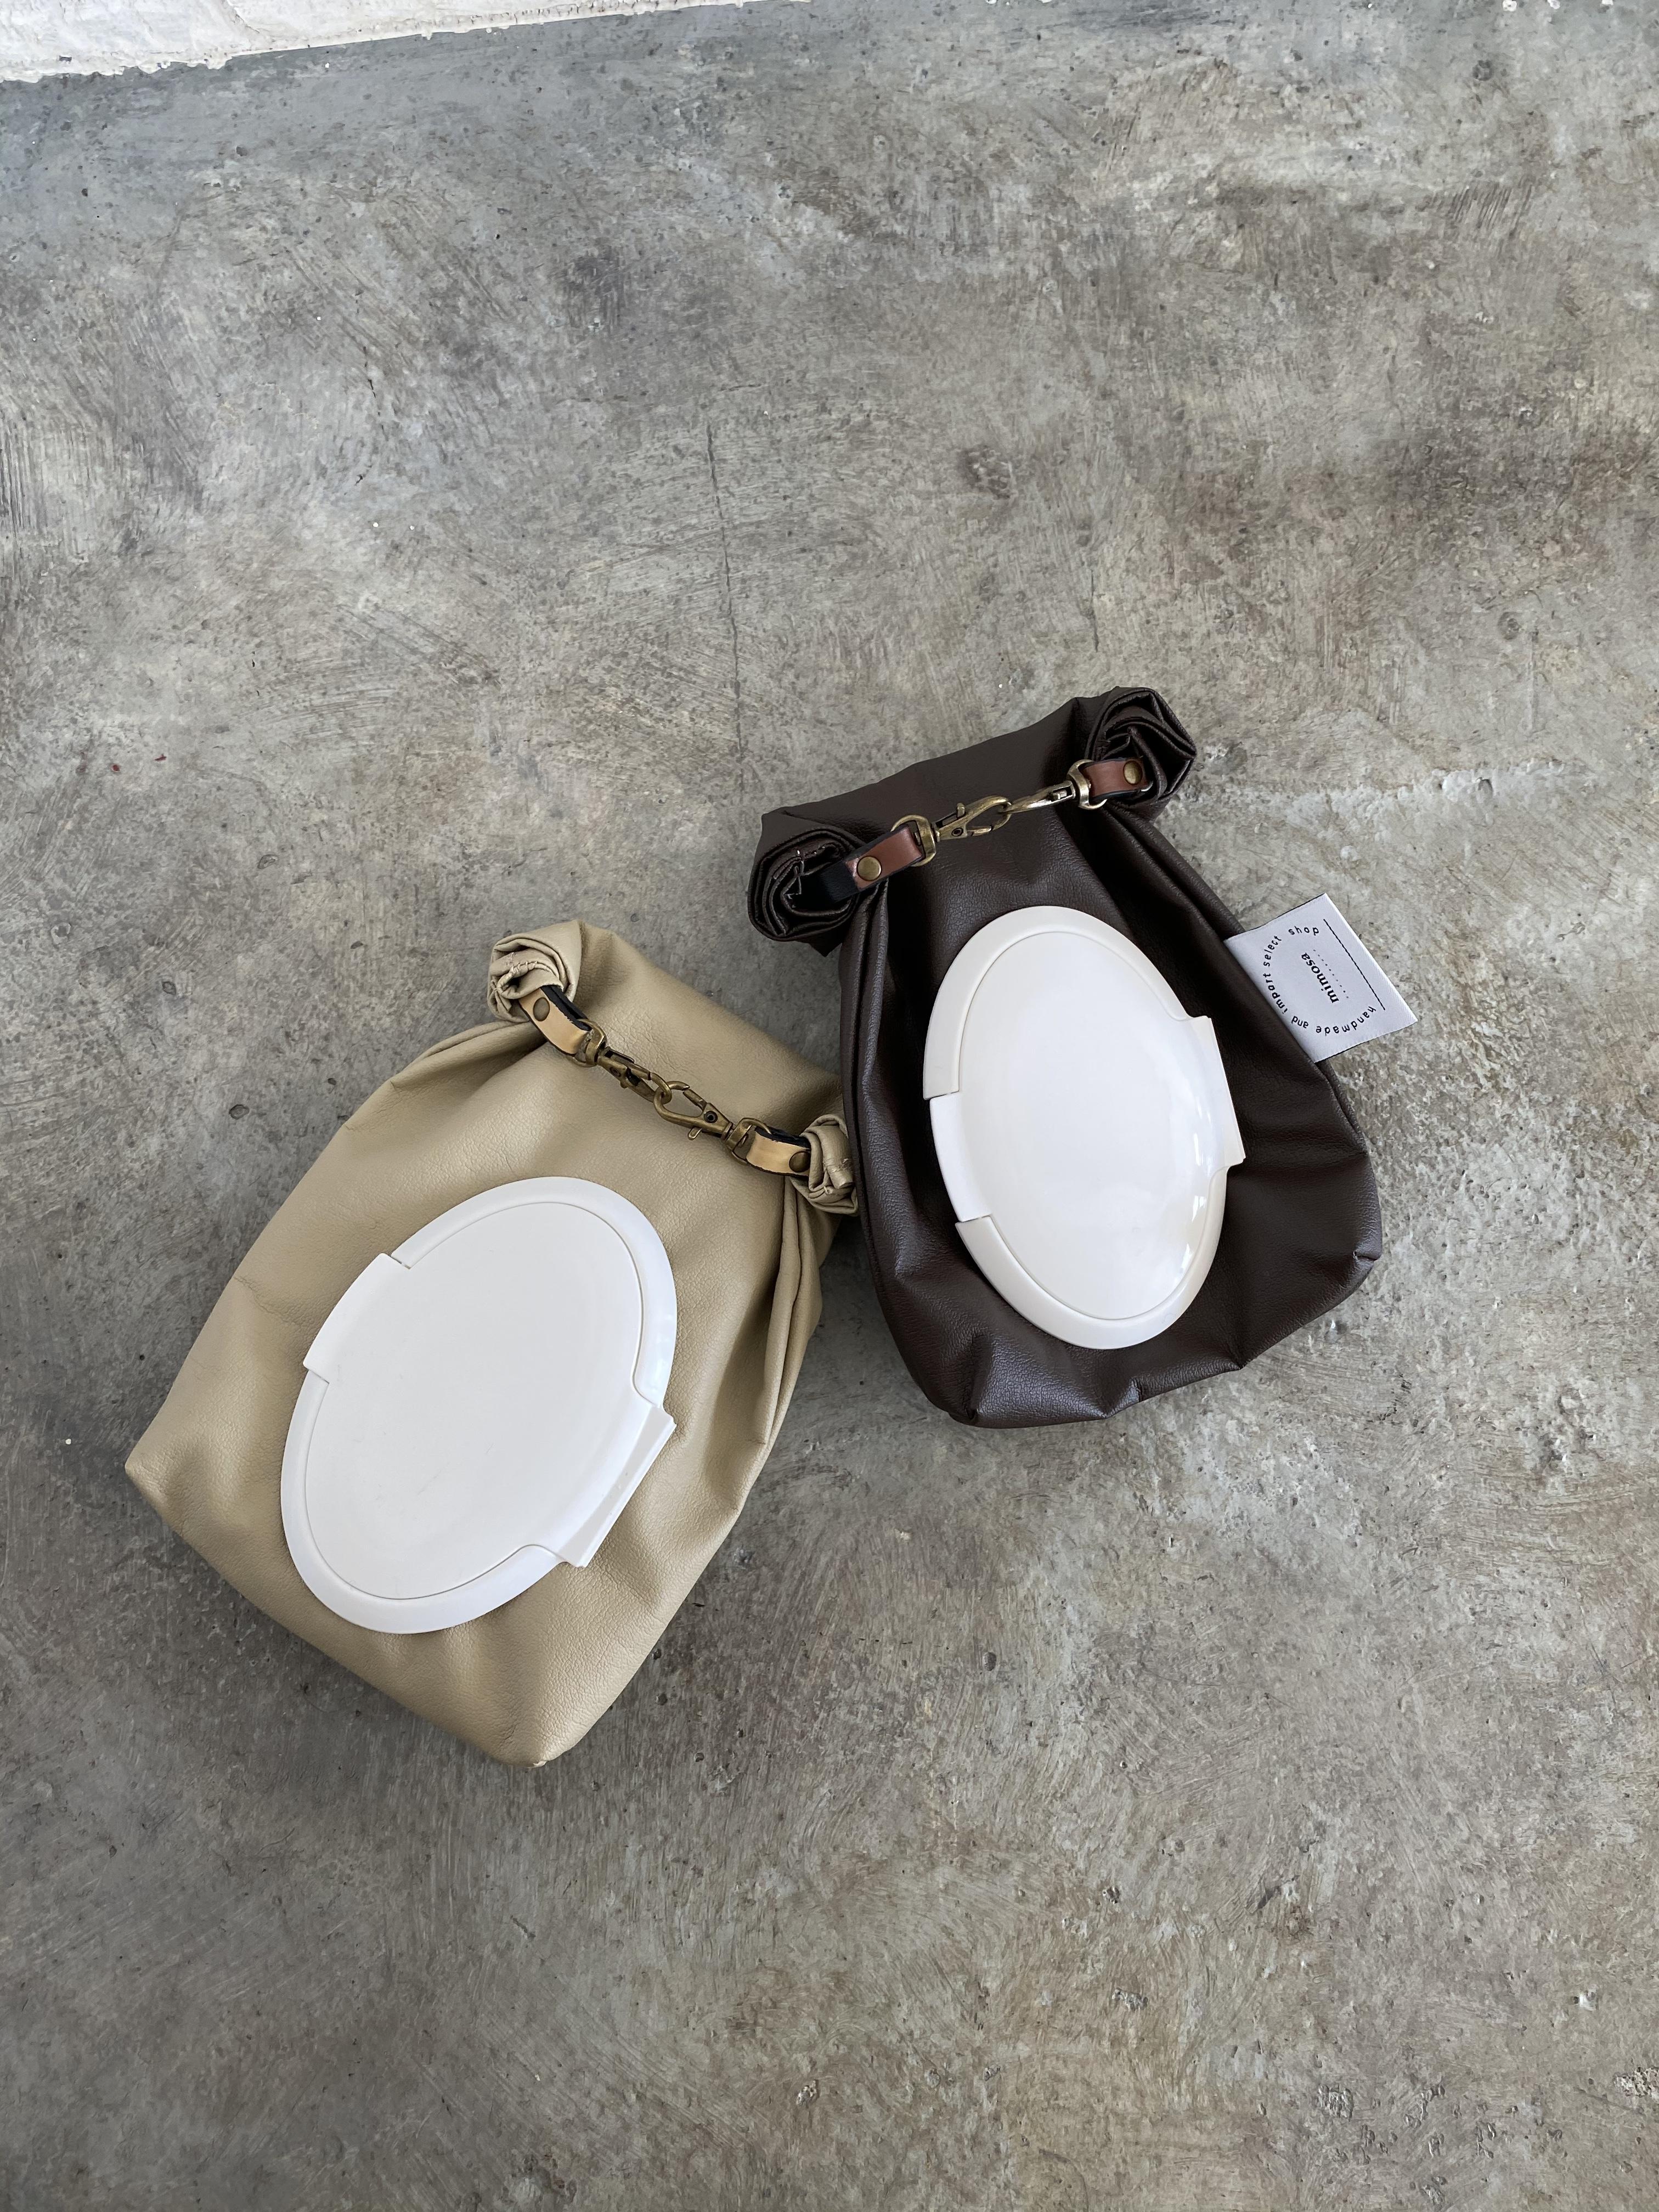 【mimosa original】portable wet wiper case